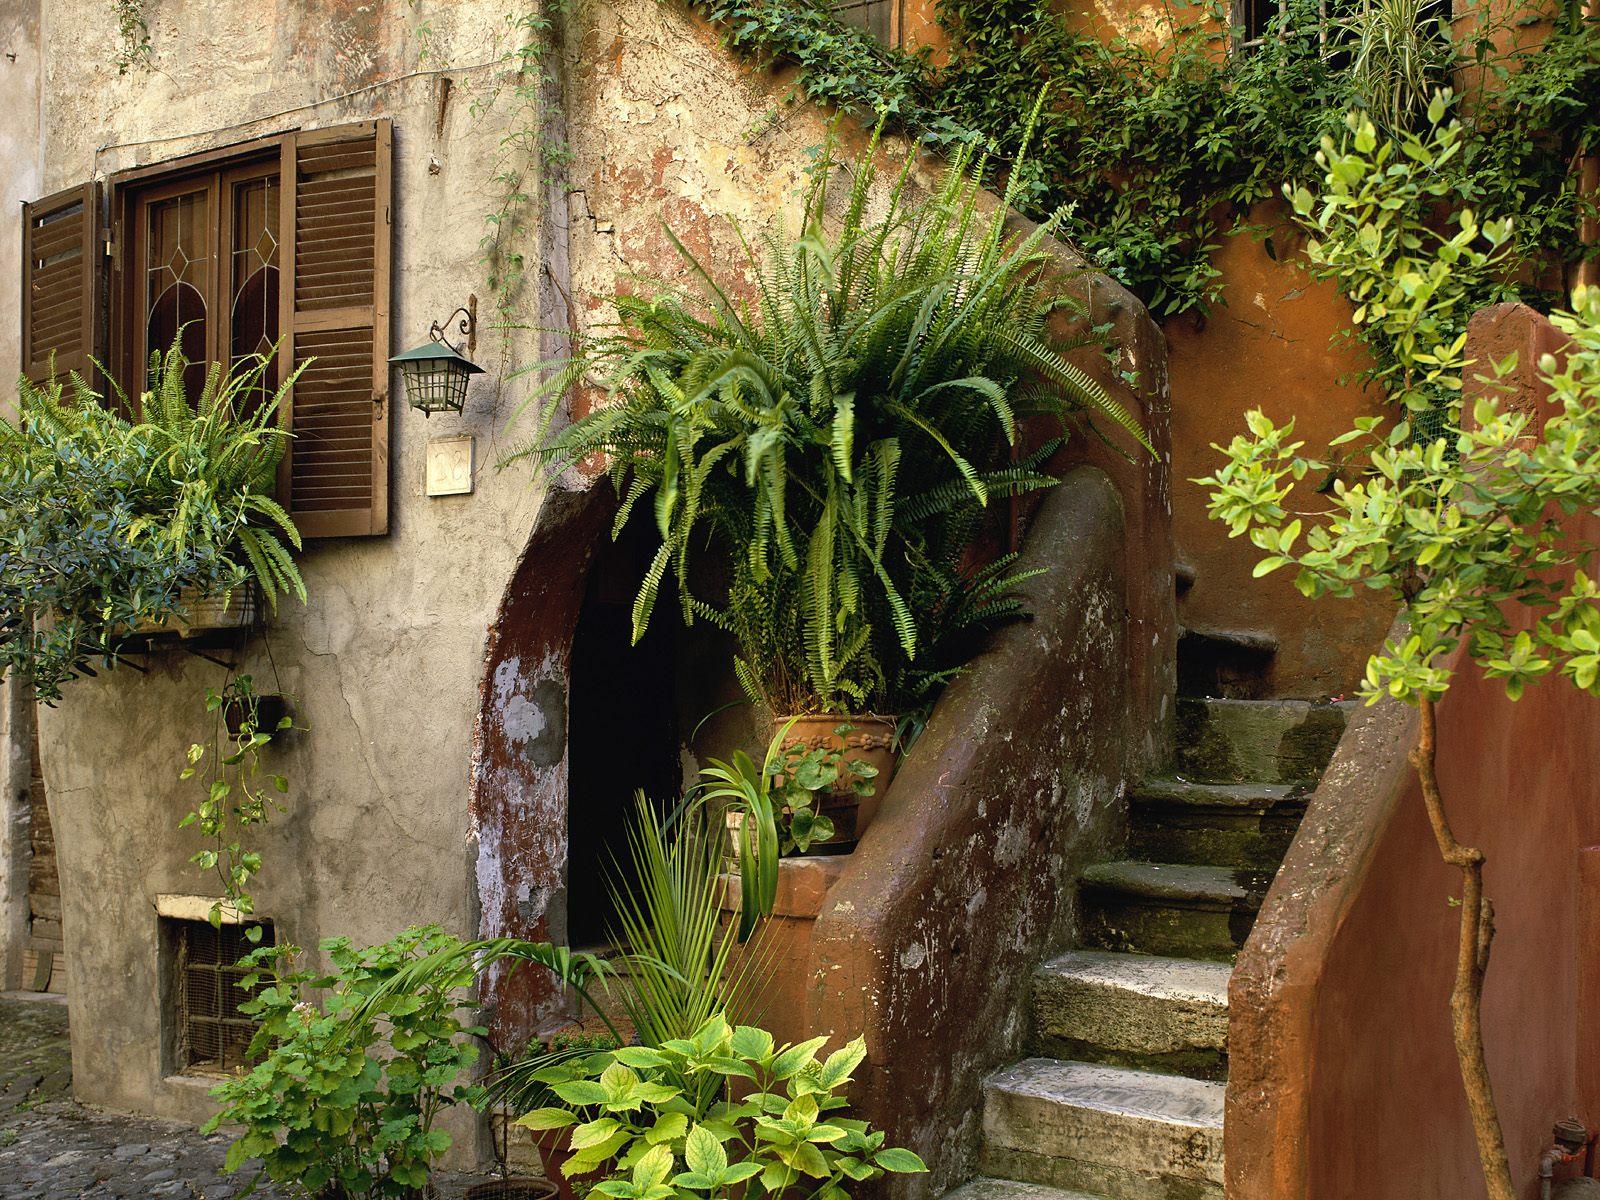 http://2.bp.blogspot.com/-2OJDmmgrj8g/Tcp4Mu0ubmI/AAAAAAAACXY/87QXkkIN4sE/s1600/Piazza+Arco+Degli+Acetari%252C+Rome%252C+Italy.jpg